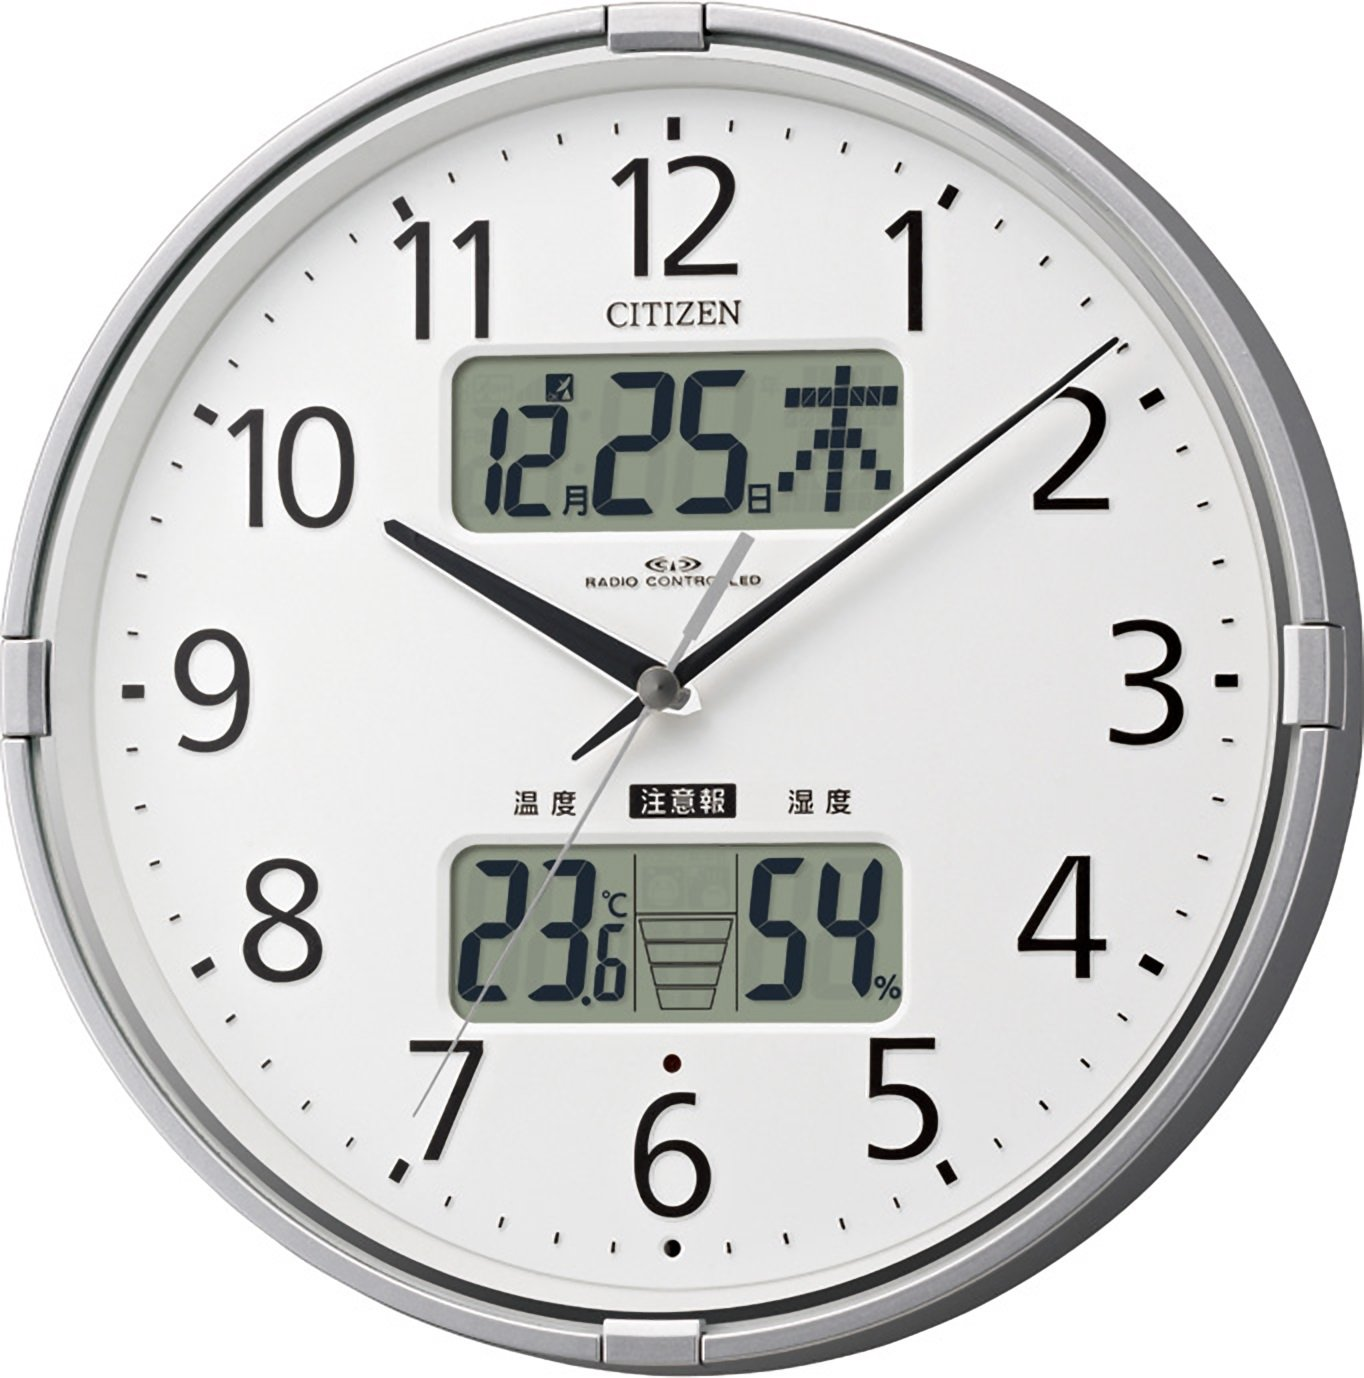 CITIZEN 【高精度温湿度計】【警告音】付電波掛時計 インフォームナビF シルバー色 4FY618-019 B00GXT1NAS